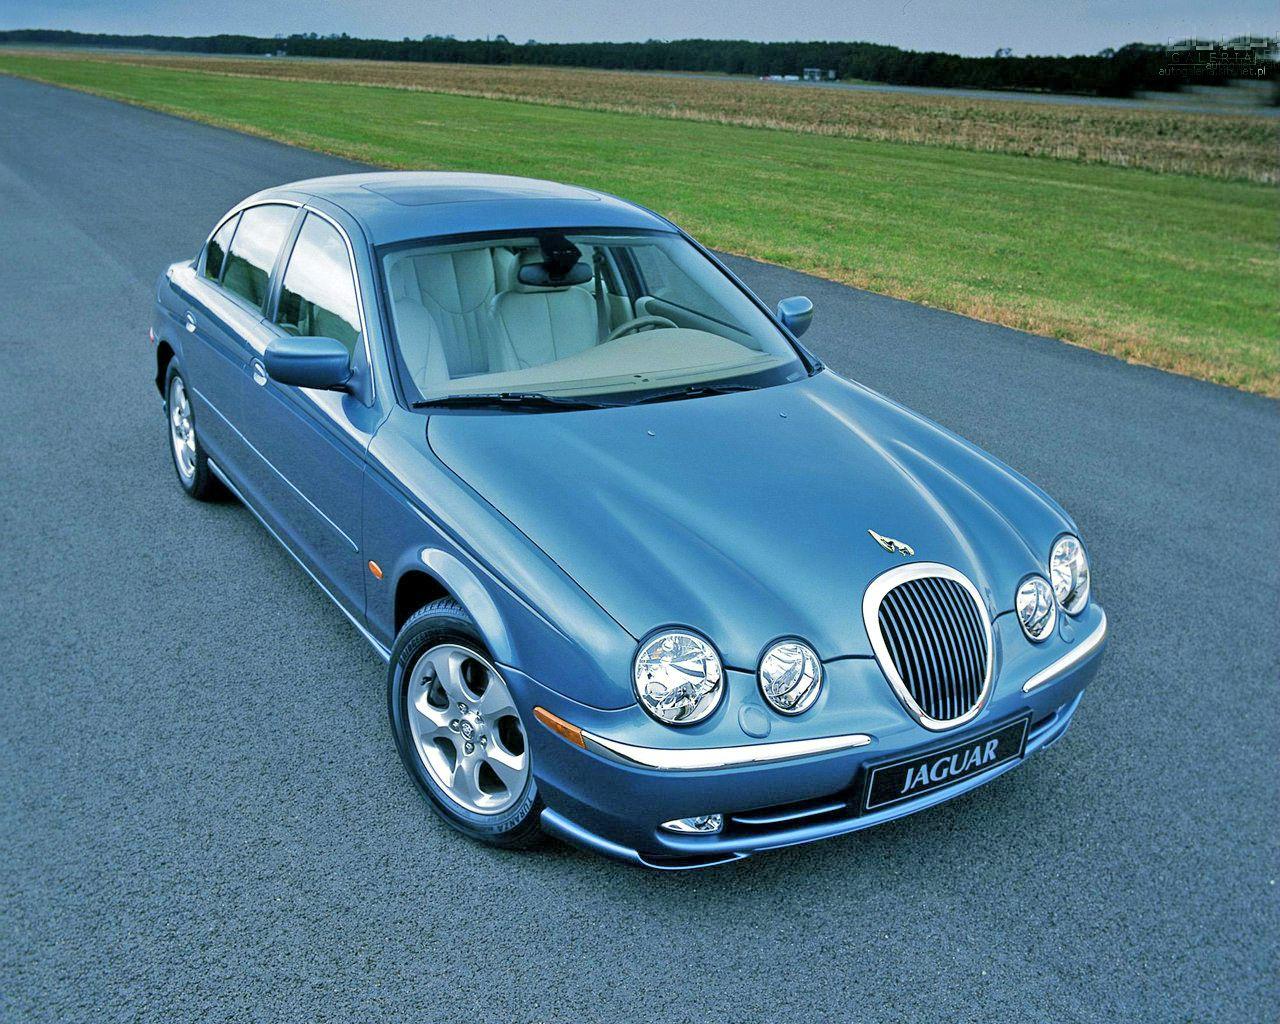 Jaguar S Type Review